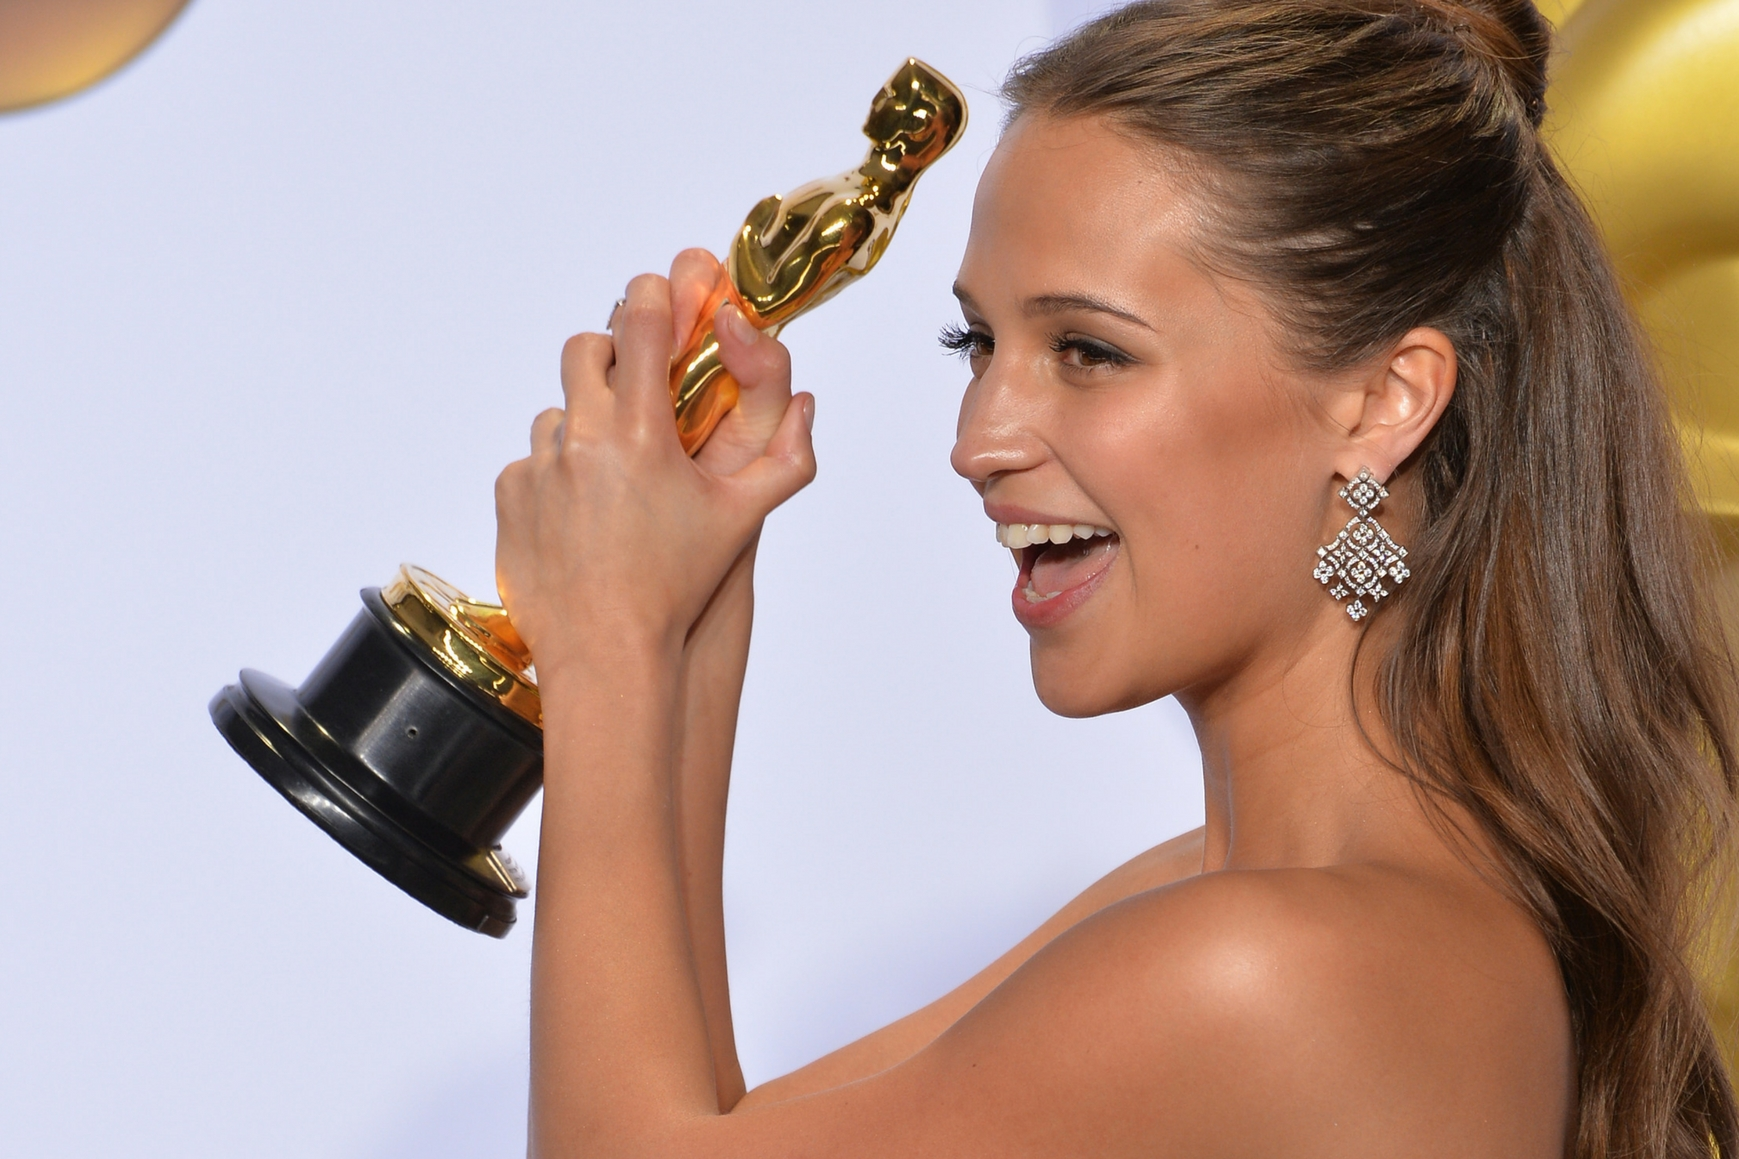 Alicia Vikander - nowa gwiazda Hollywood